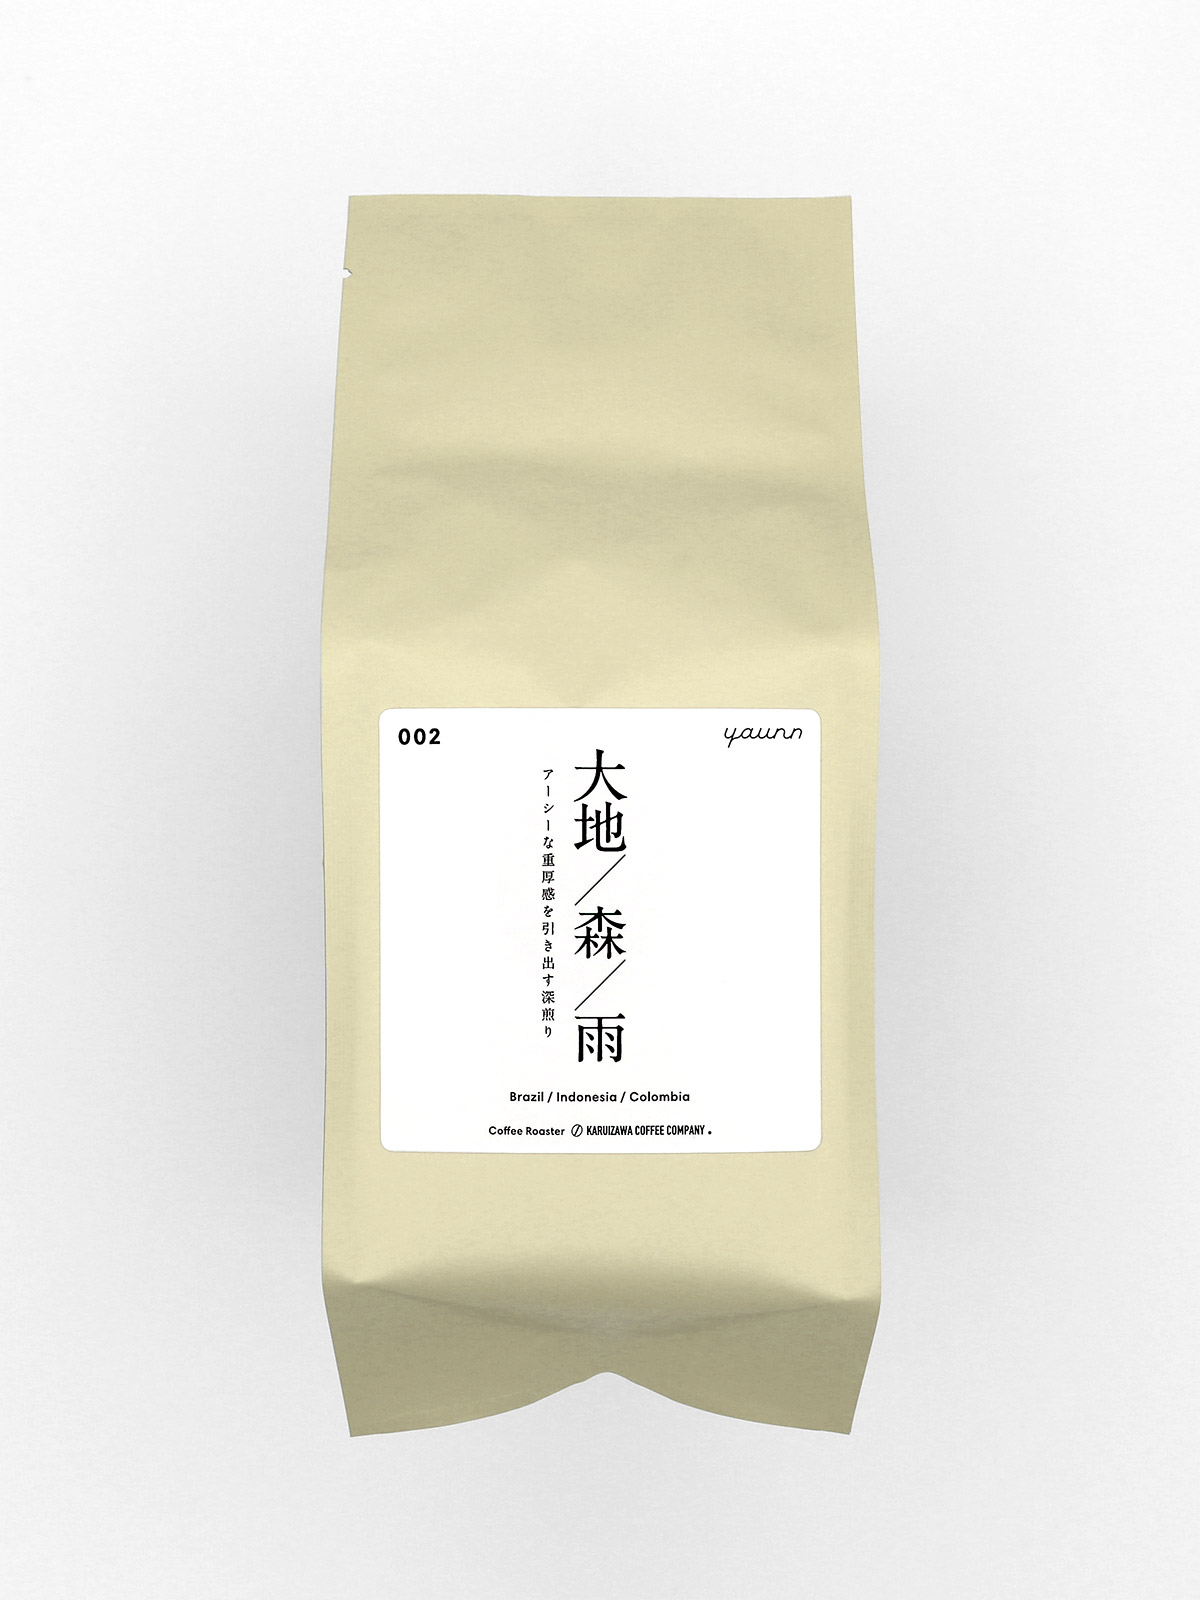 yaunn 珈琲 002「大地/森/雨」 Roasted by 軽井沢コーヒーカンパニー